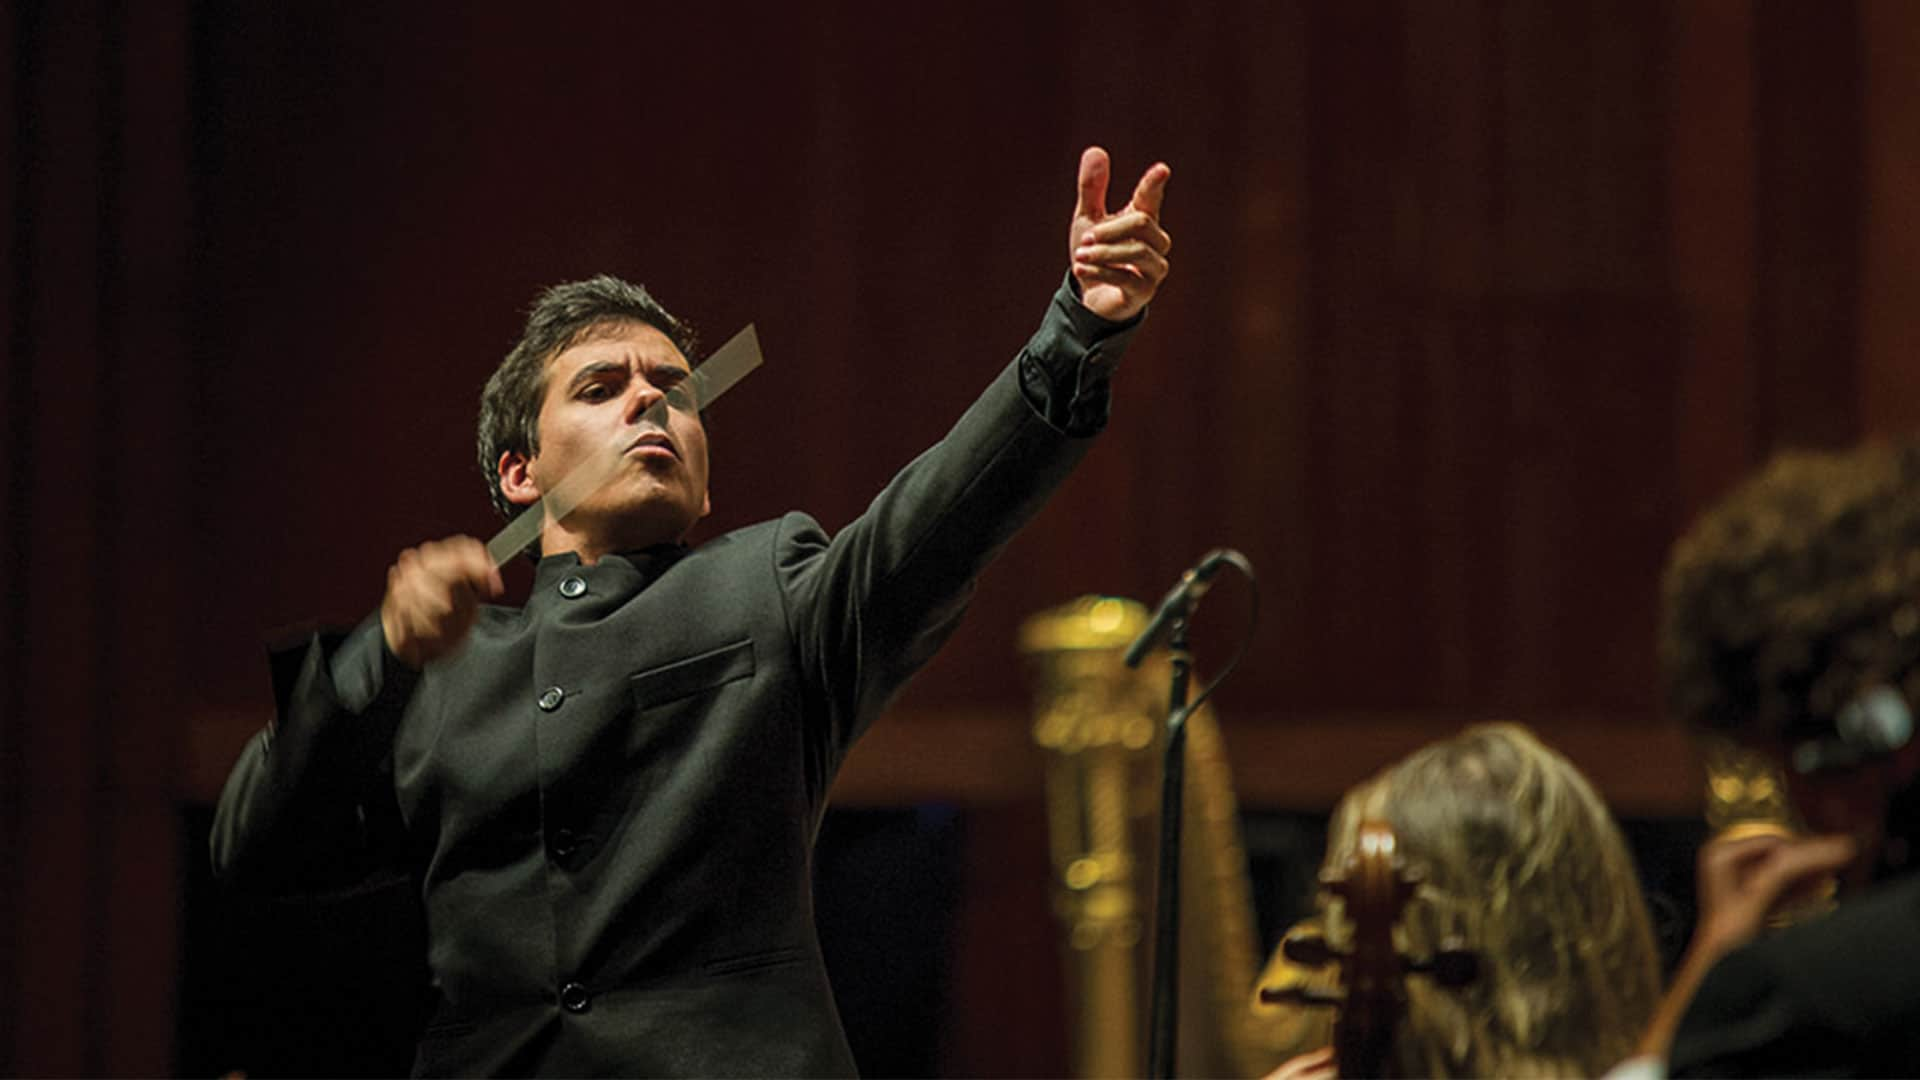 Sinfonico 11. Nuno Coelho